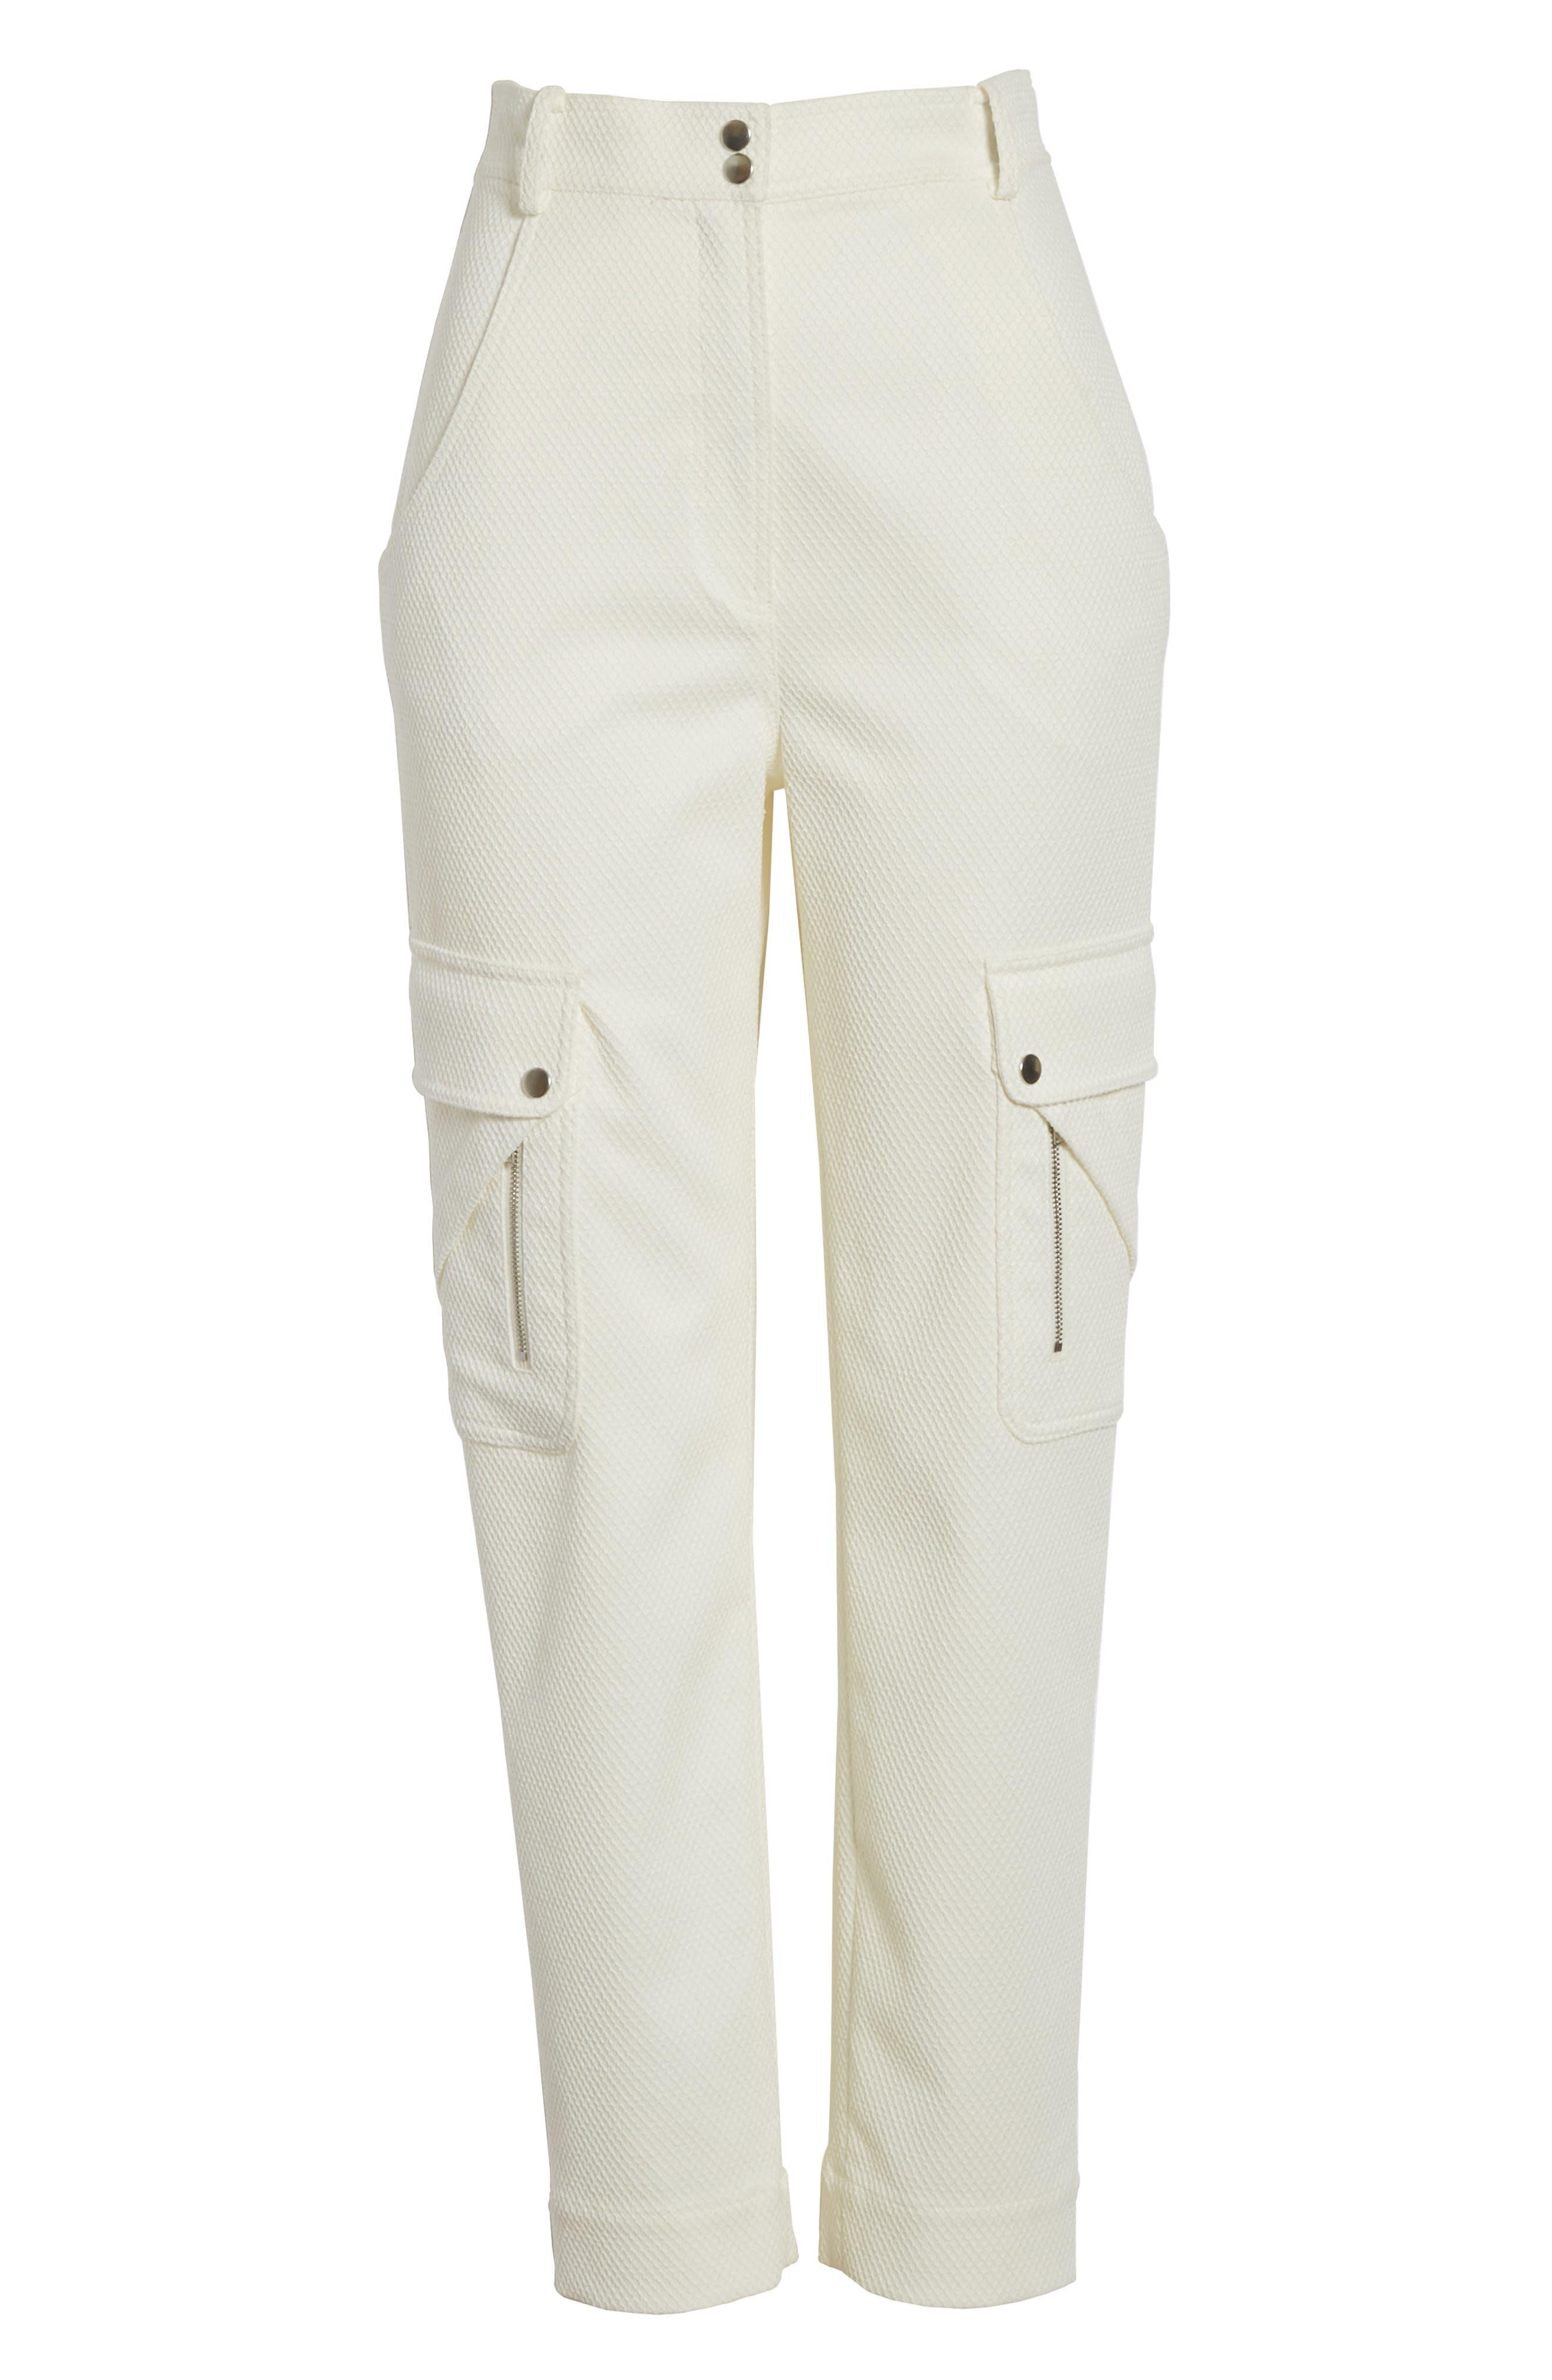 Textured Stretch Cotton Blend Utility Pants,                             Alternate thumbnail 6, color,                             116